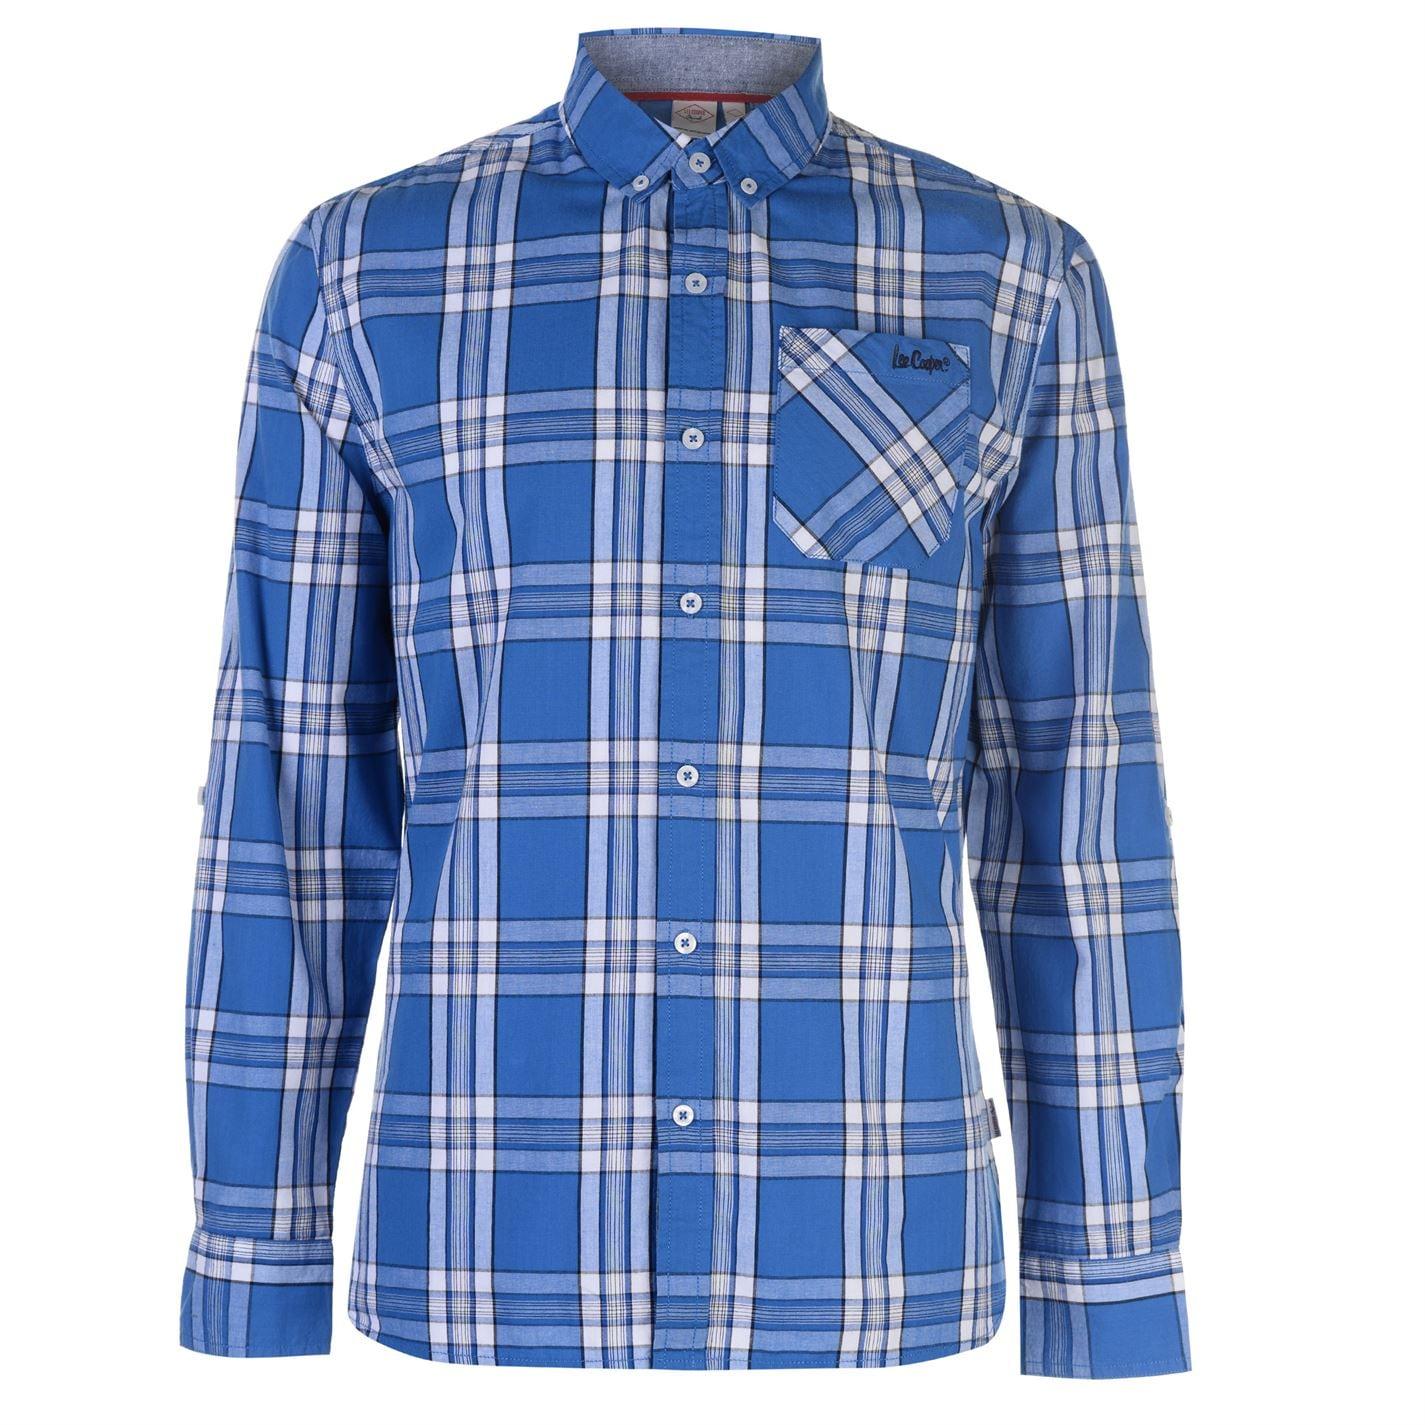 Lee Cooper Long Sleeve Check Pánská košile 55842791 SD_Large